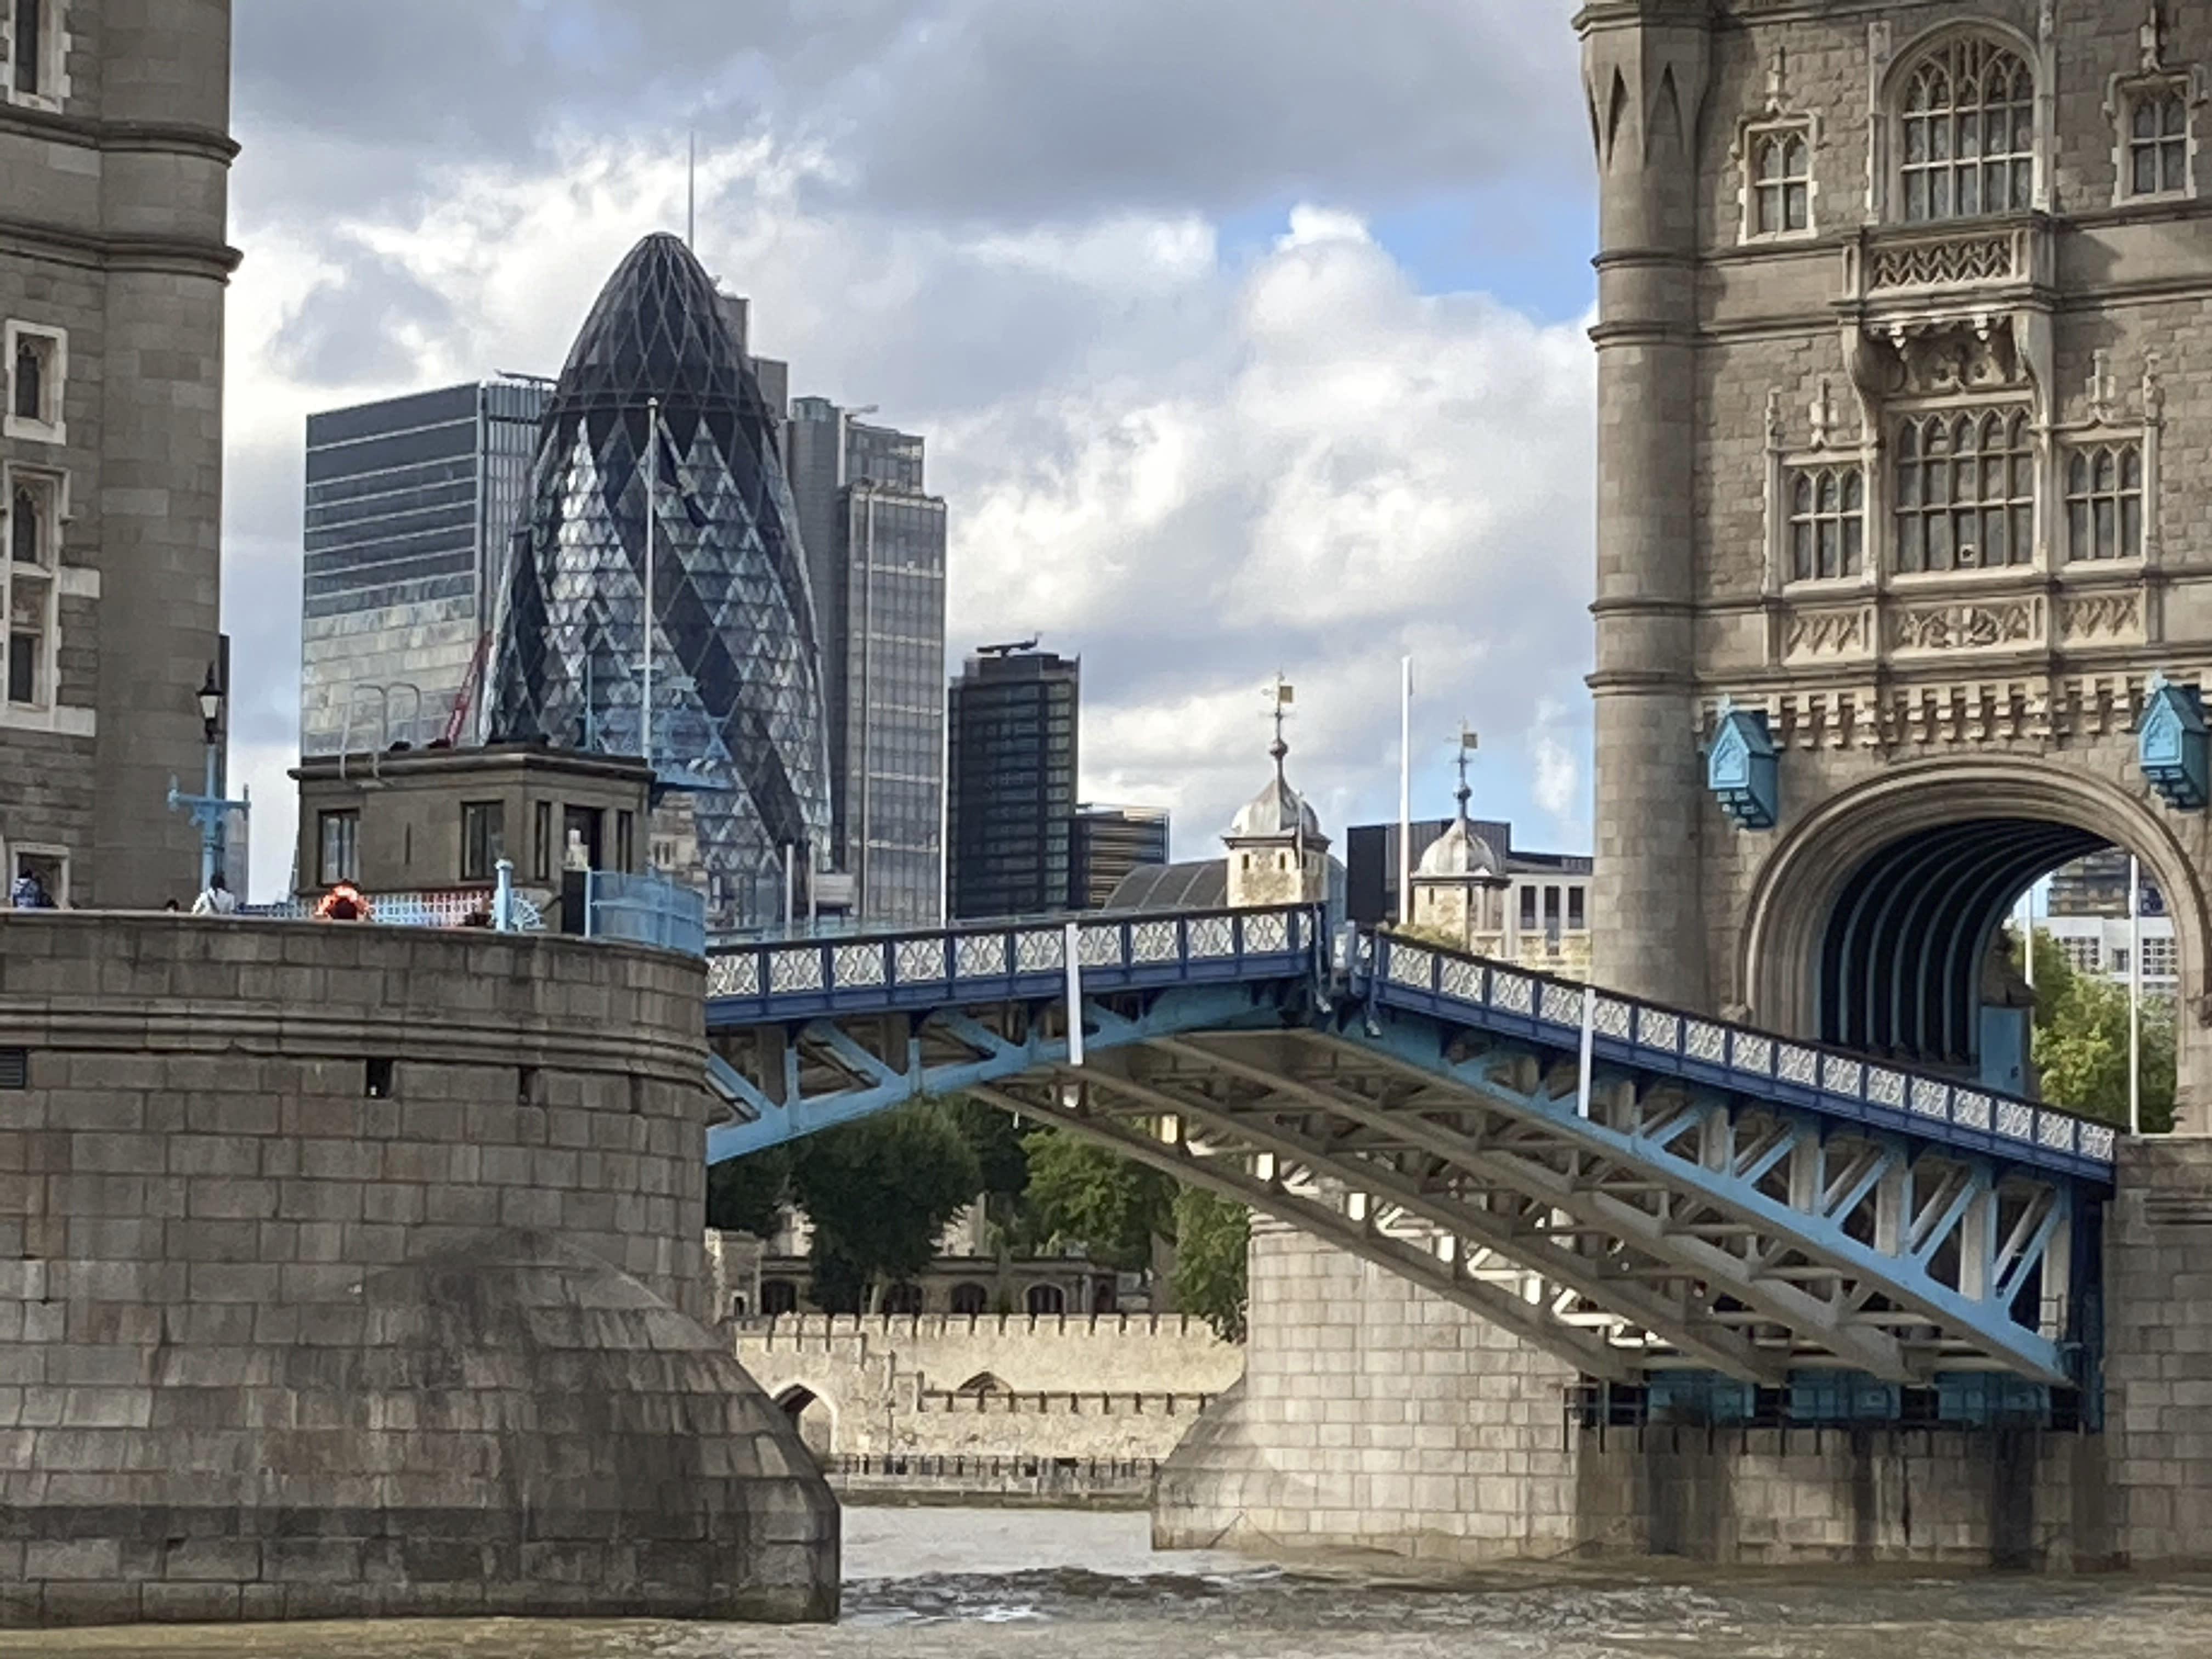 Tower Bridge stuck open, causing traffic chaos